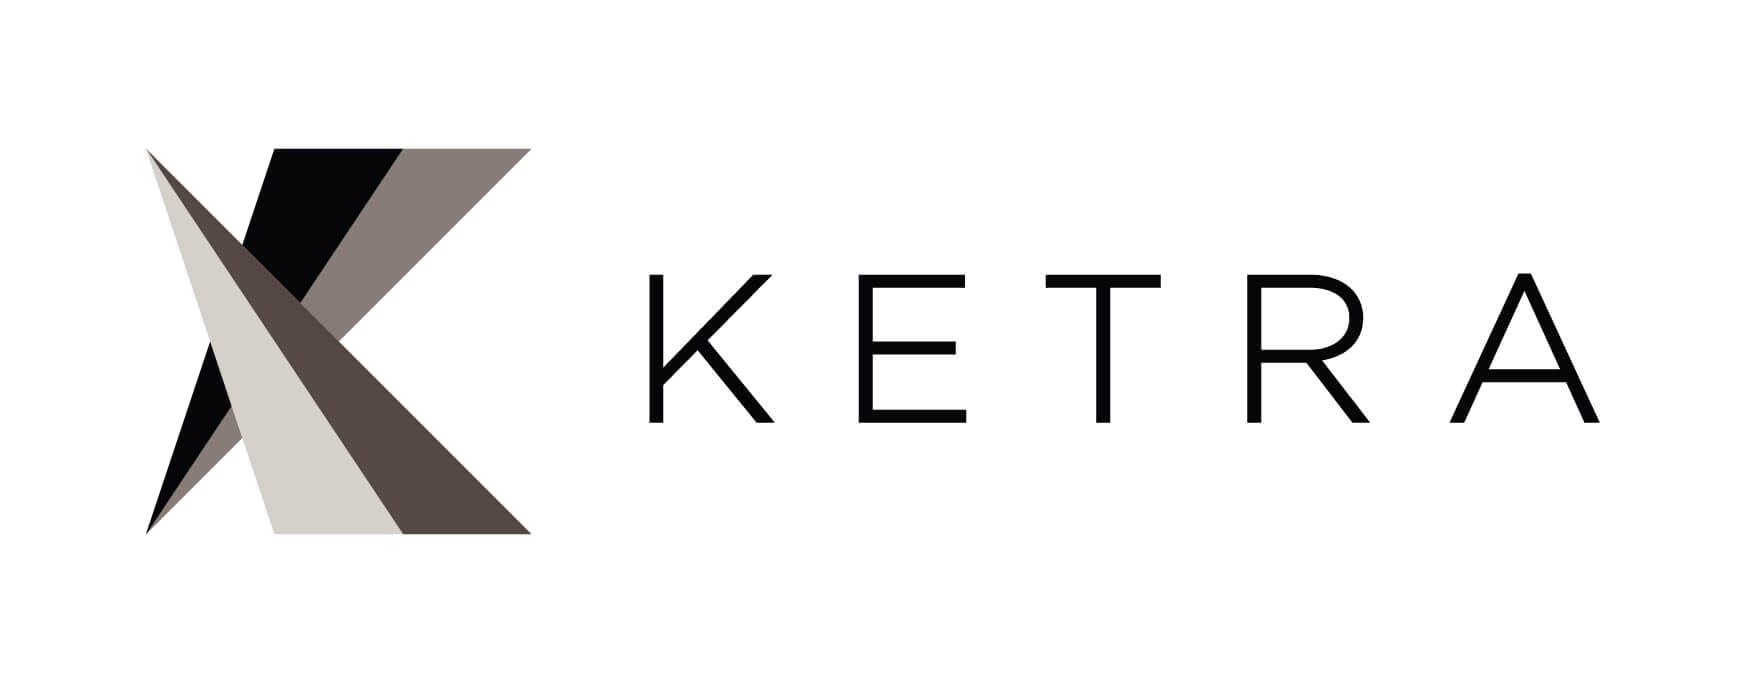 logo ketra linecard ksa Ketra Pelicula at bayanpartner.co